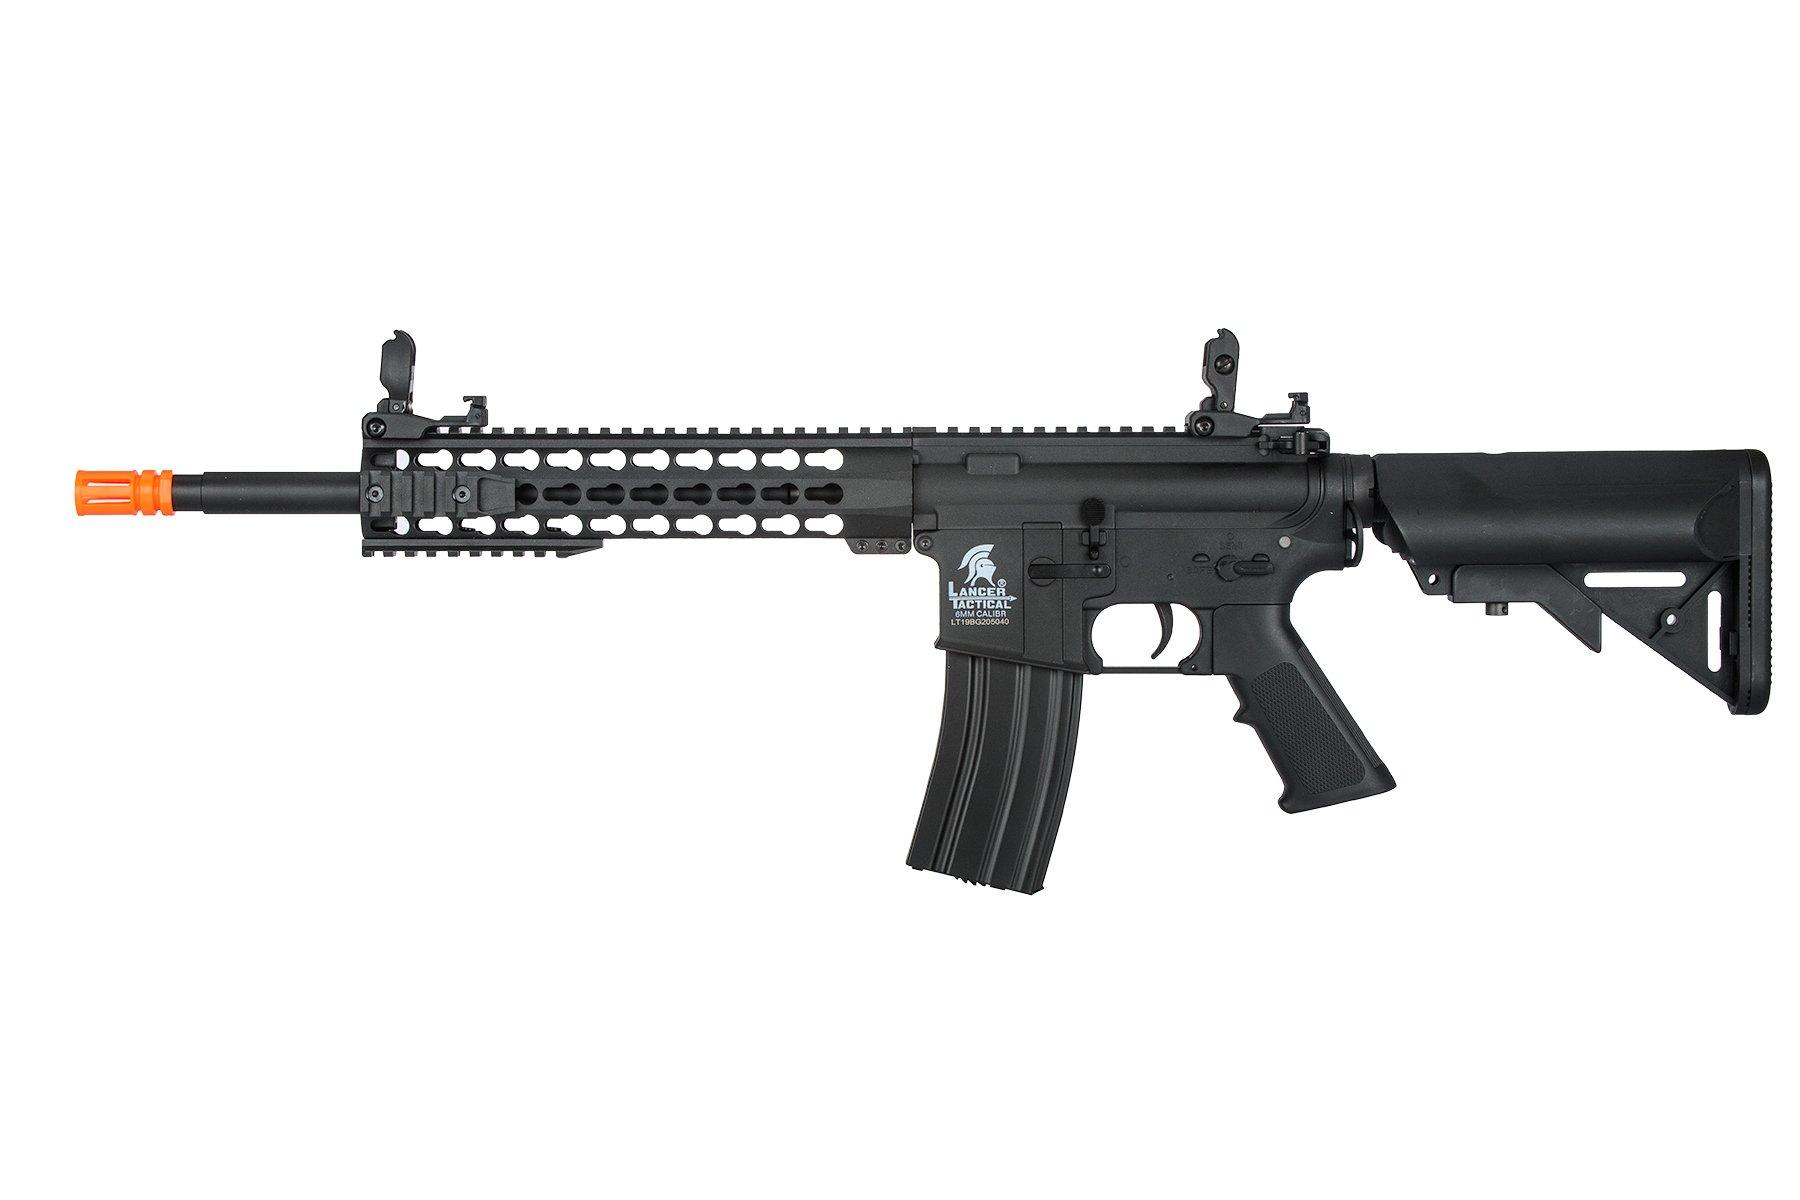 Lancer Tactical G2 Airsoft LT-19B M4 Carbine 10'' AEG Rifle - BLACK by Lancer Tactical